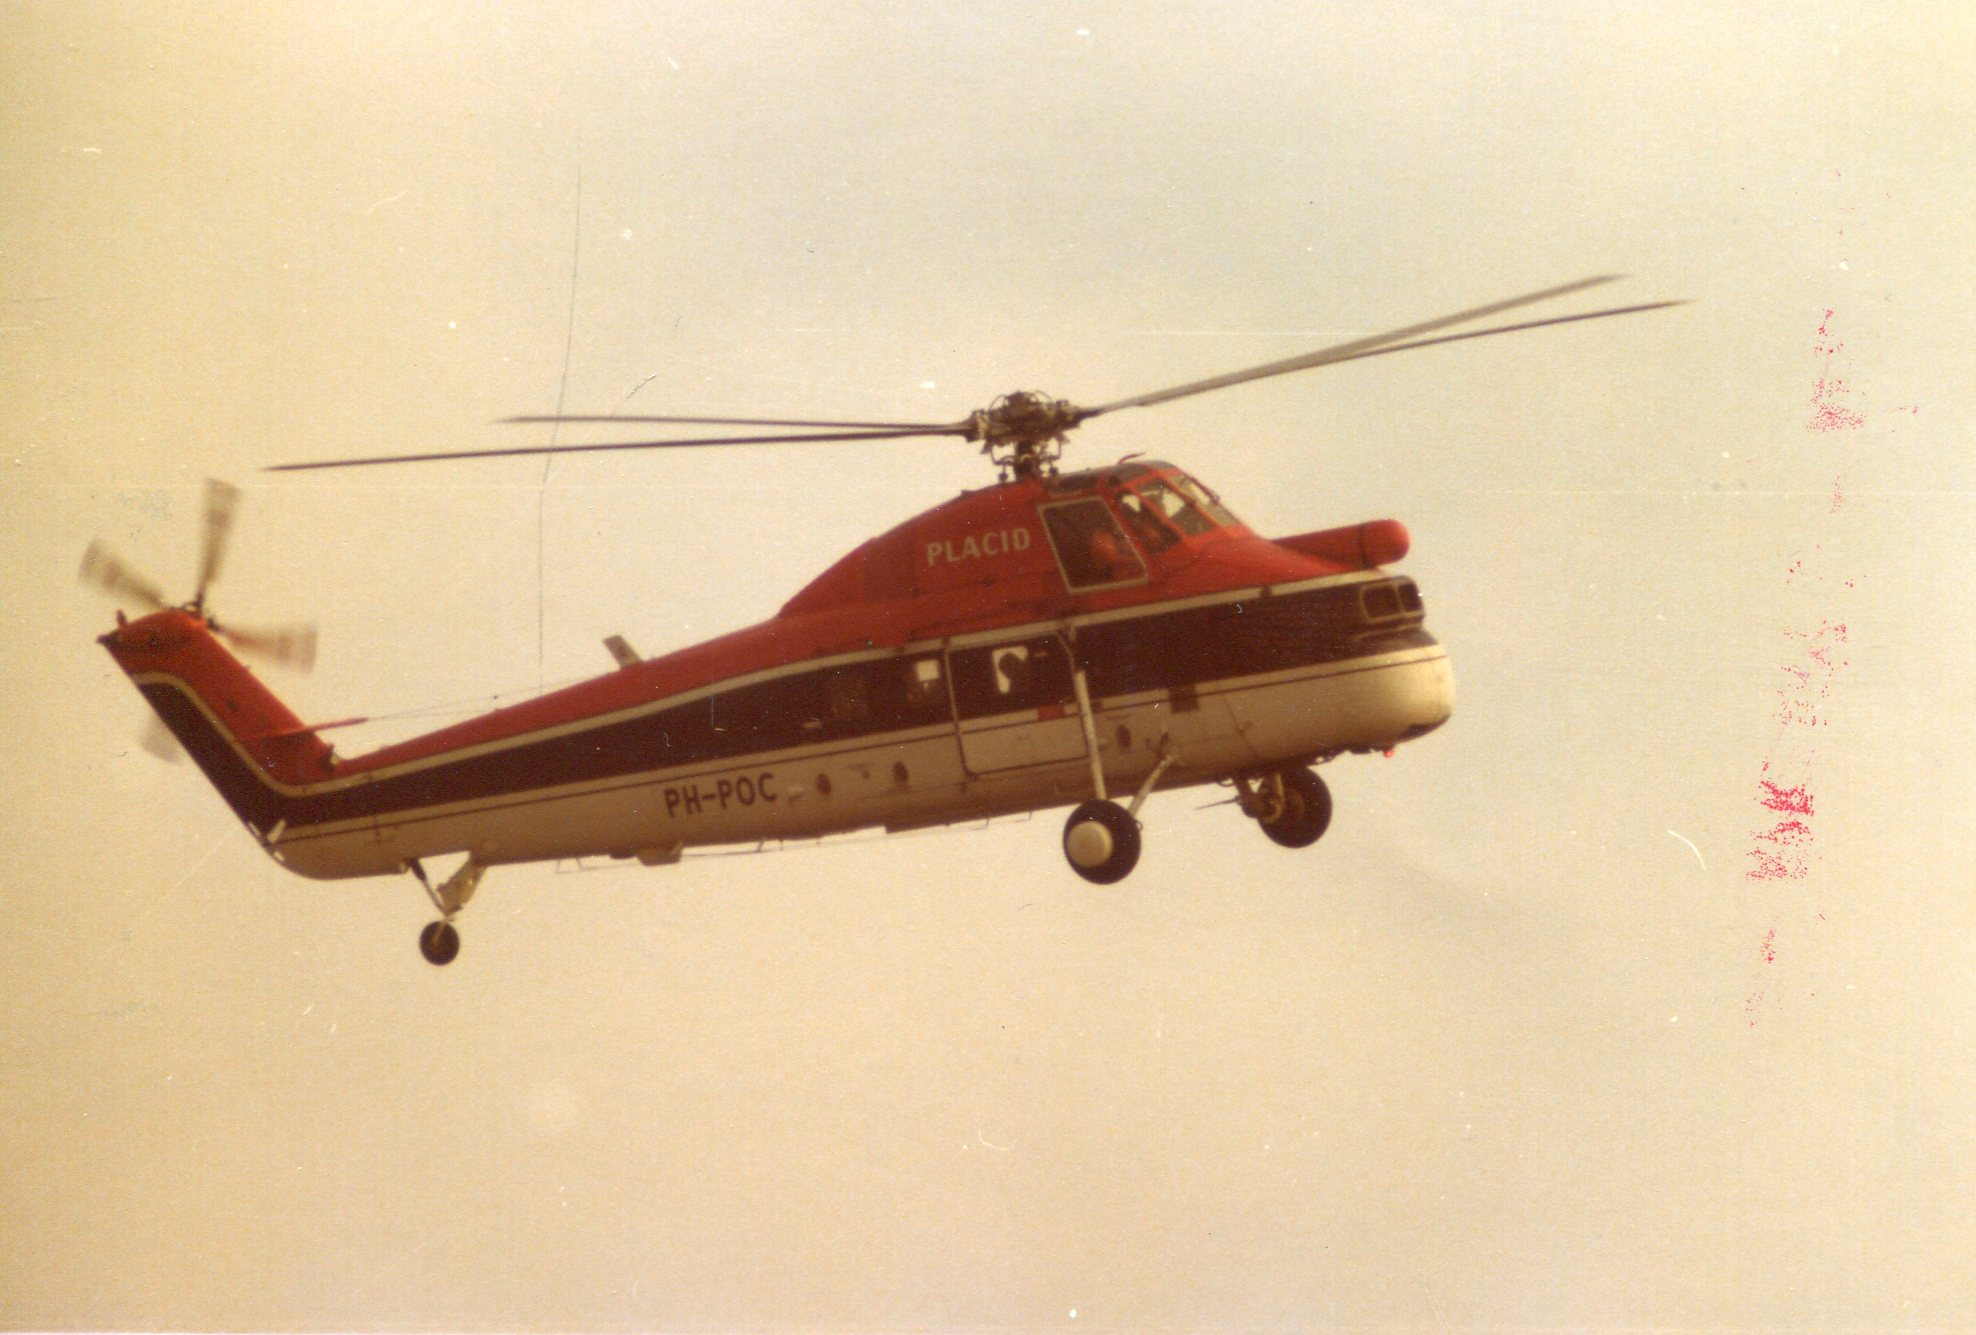 Naam: Den Helder , april 1977 (3).jpg Bekeken: 229 Grootte: 334,4 KB